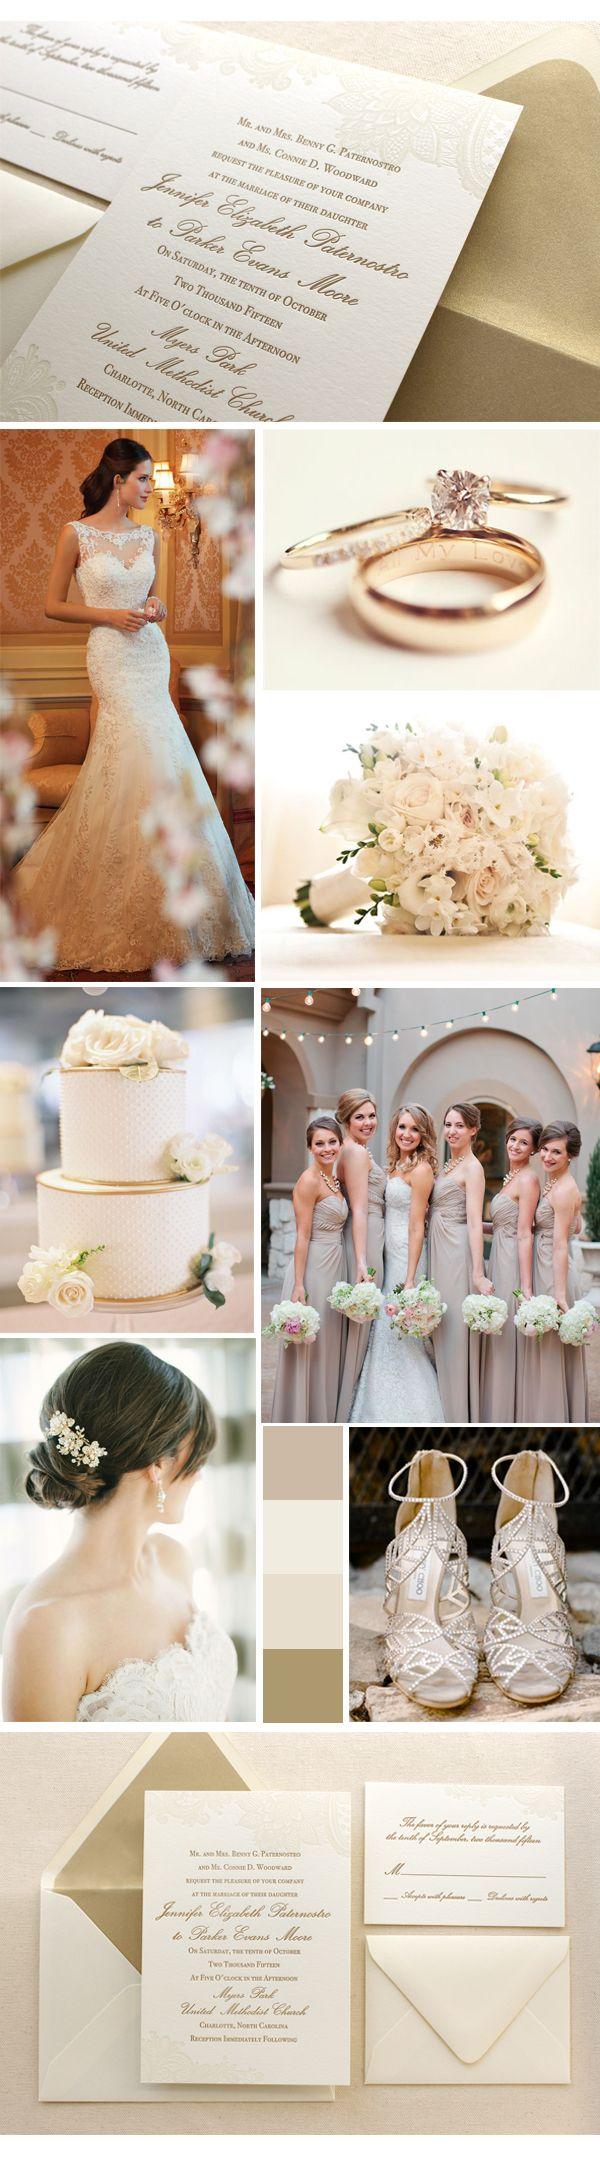 Vintage floral lace, champagne, ivory, gold wedding.